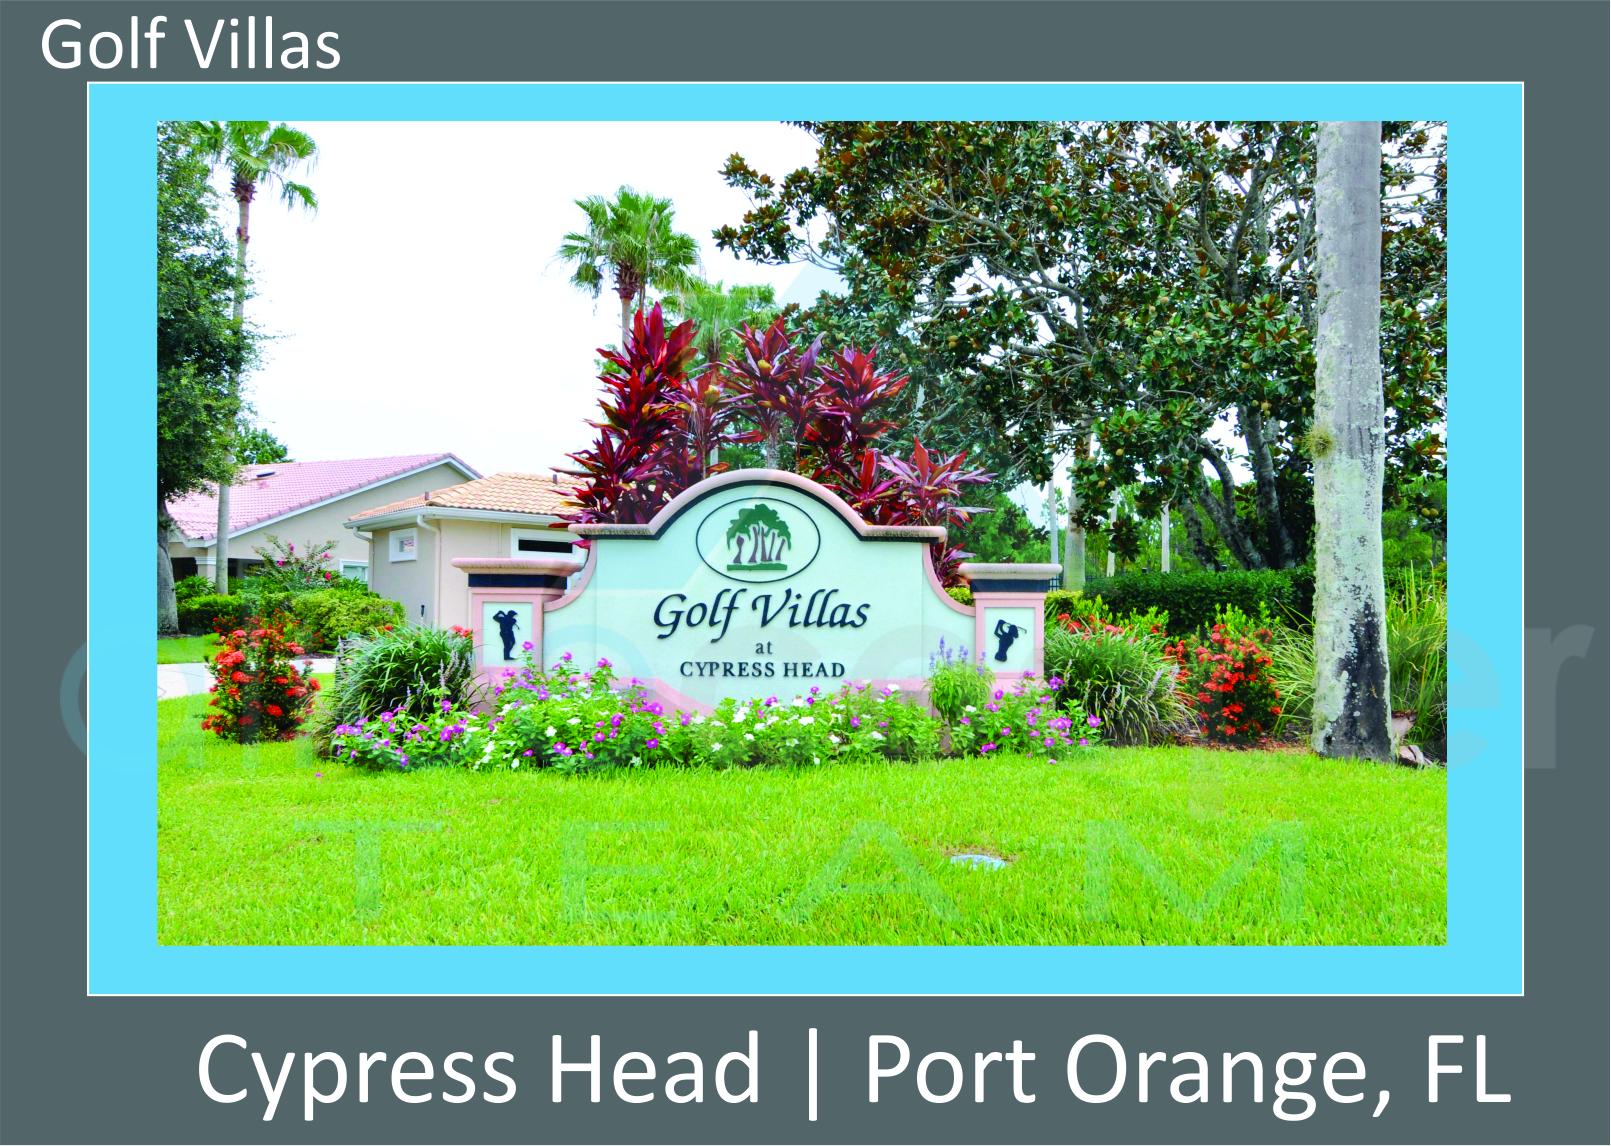 Cypress Head Golf Villas Neighborhood Entrance Sign